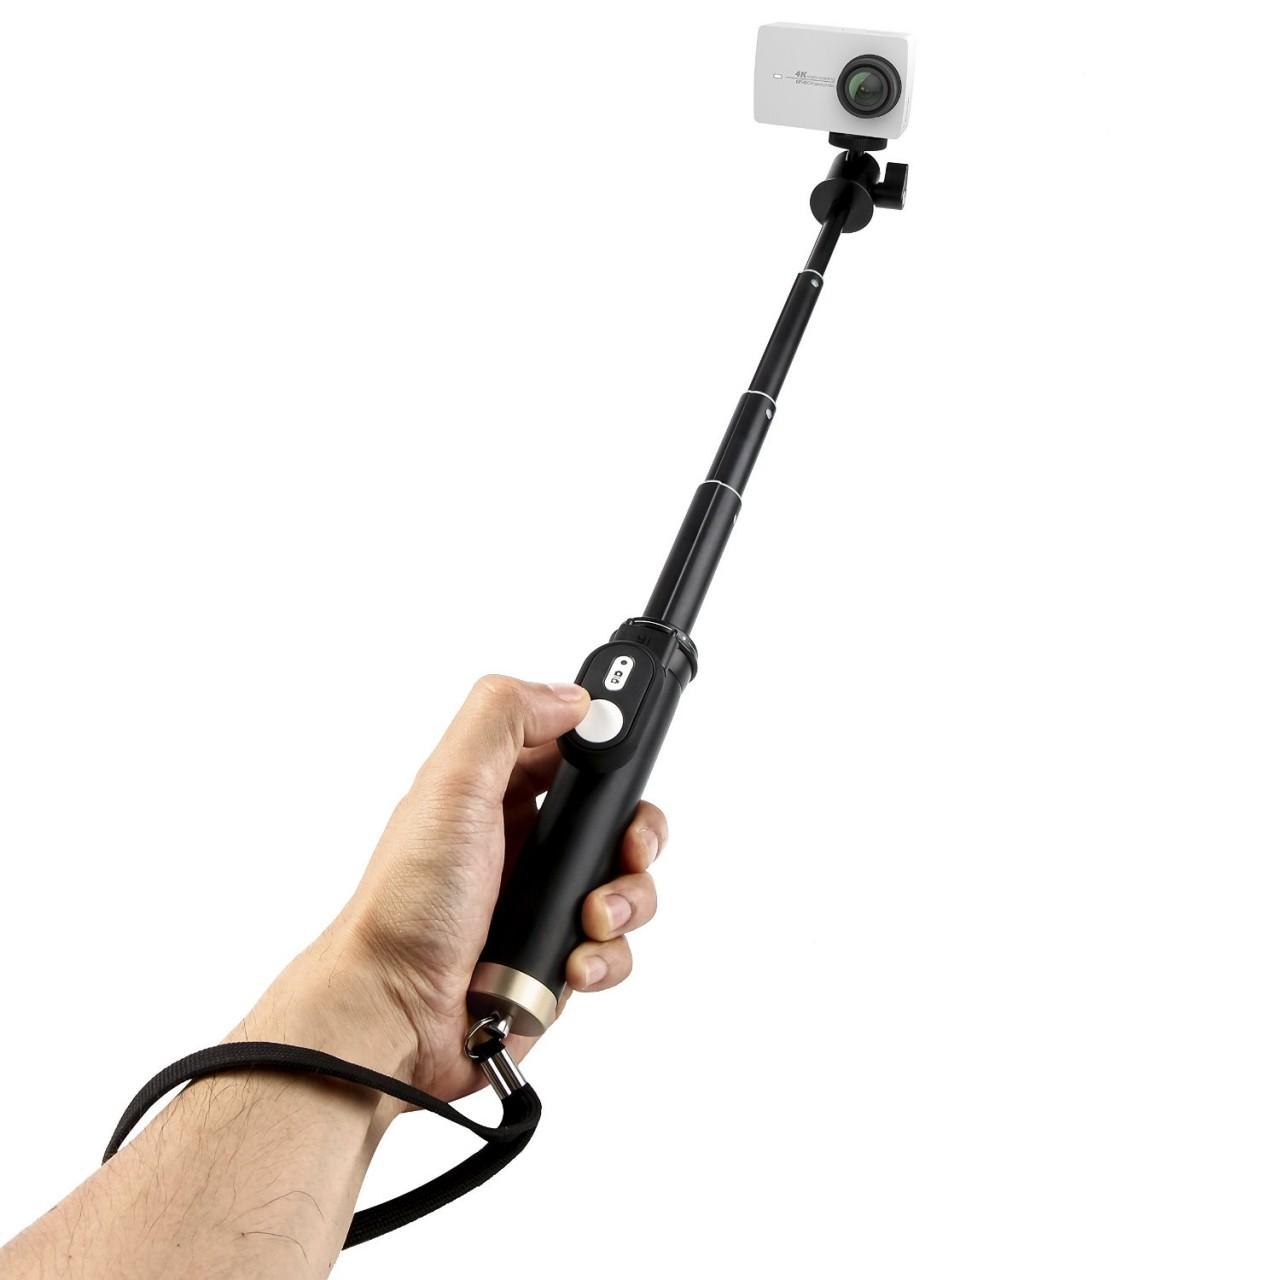 yi 4k action camera with selfie stick bluetooth remote. Black Bedroom Furniture Sets. Home Design Ideas